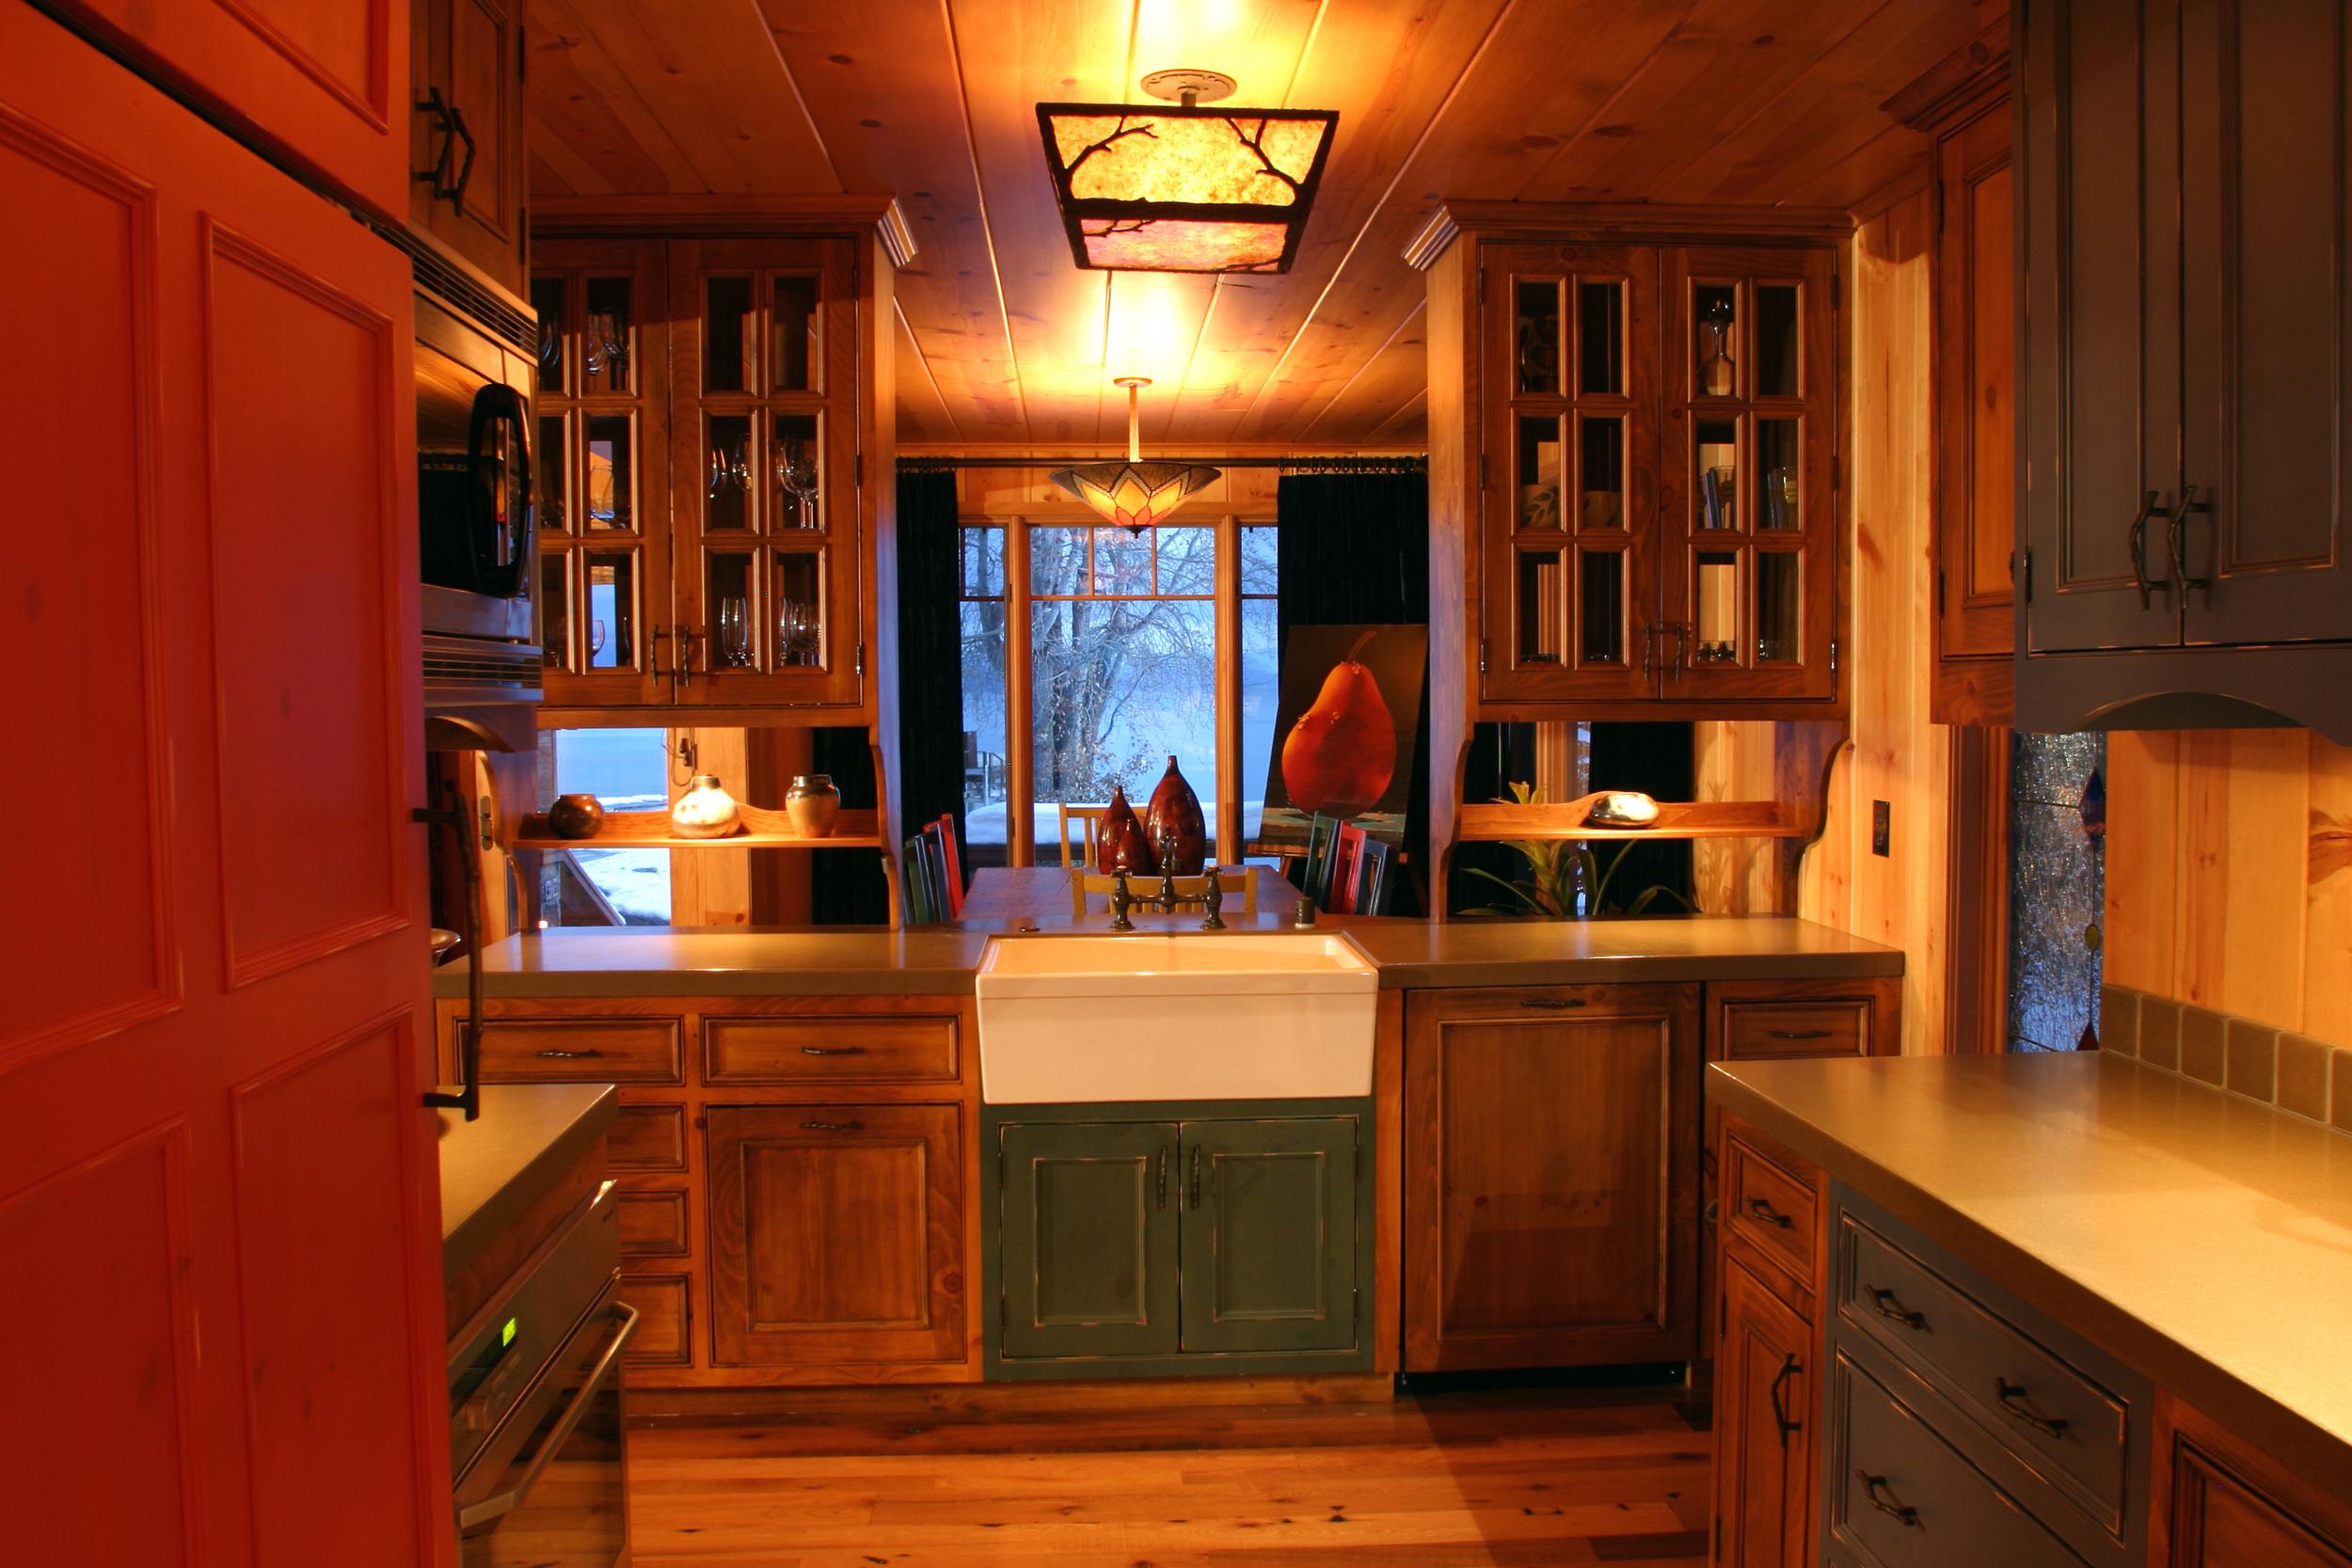 kitchen-into-dining.jpg